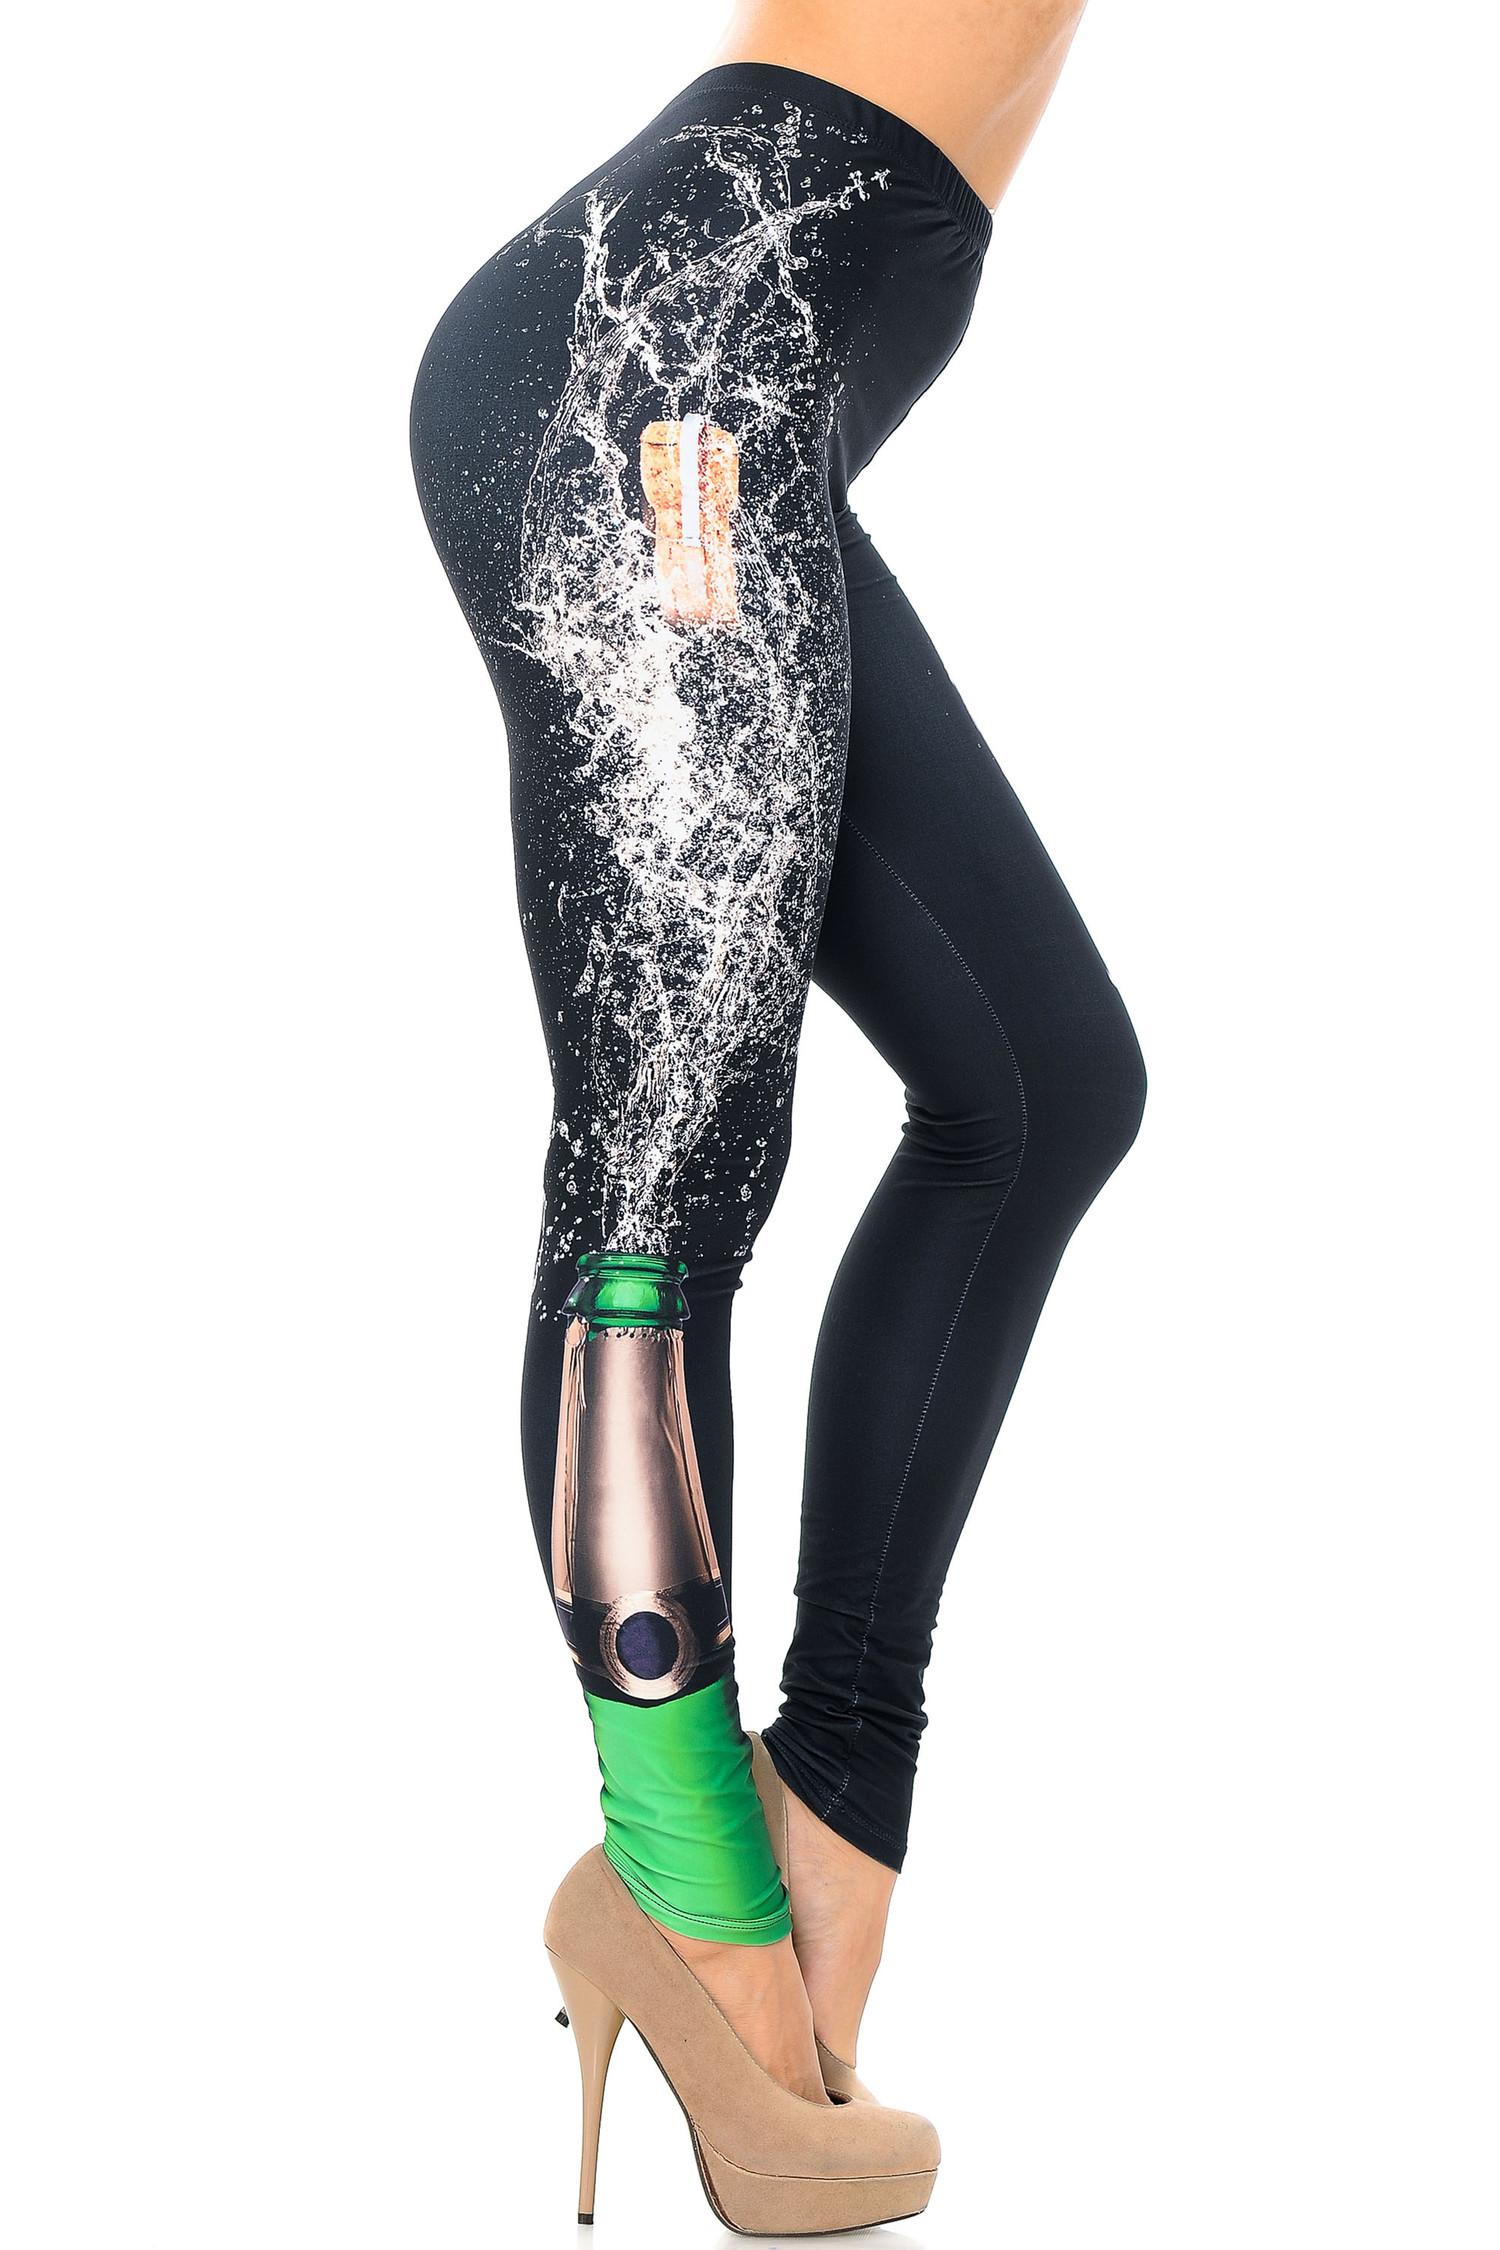 Creamy Soft Pop the Champagne Leggings - USA Fashion™